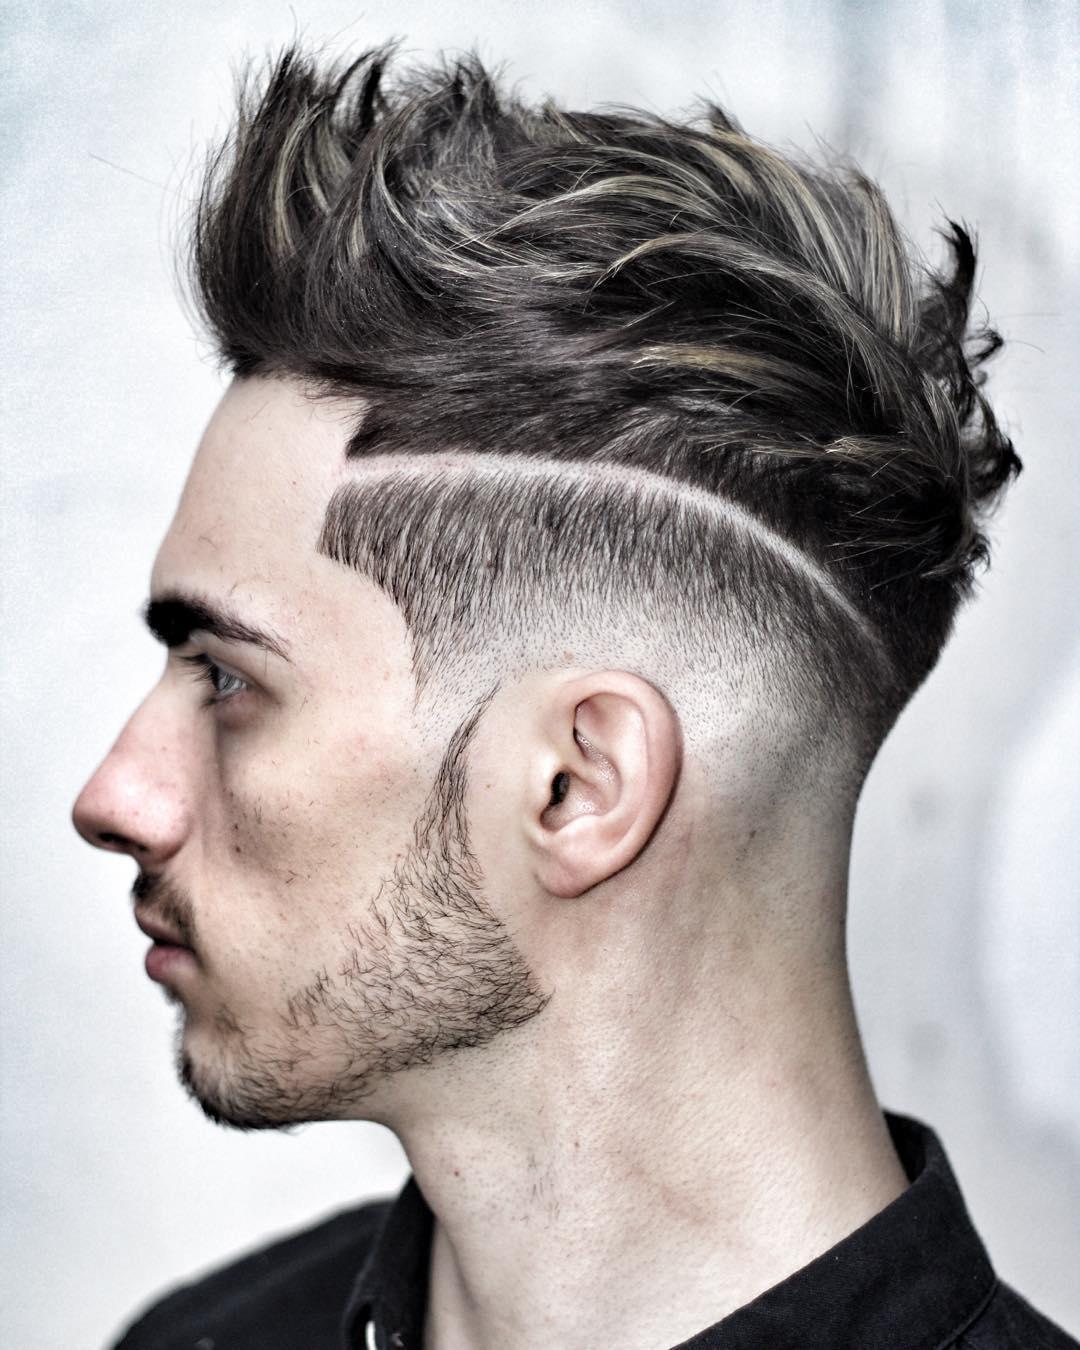 Sensational Short Hair Hairstyles And Haircuts For Men 2017 Short Hairstyles Gunalazisus